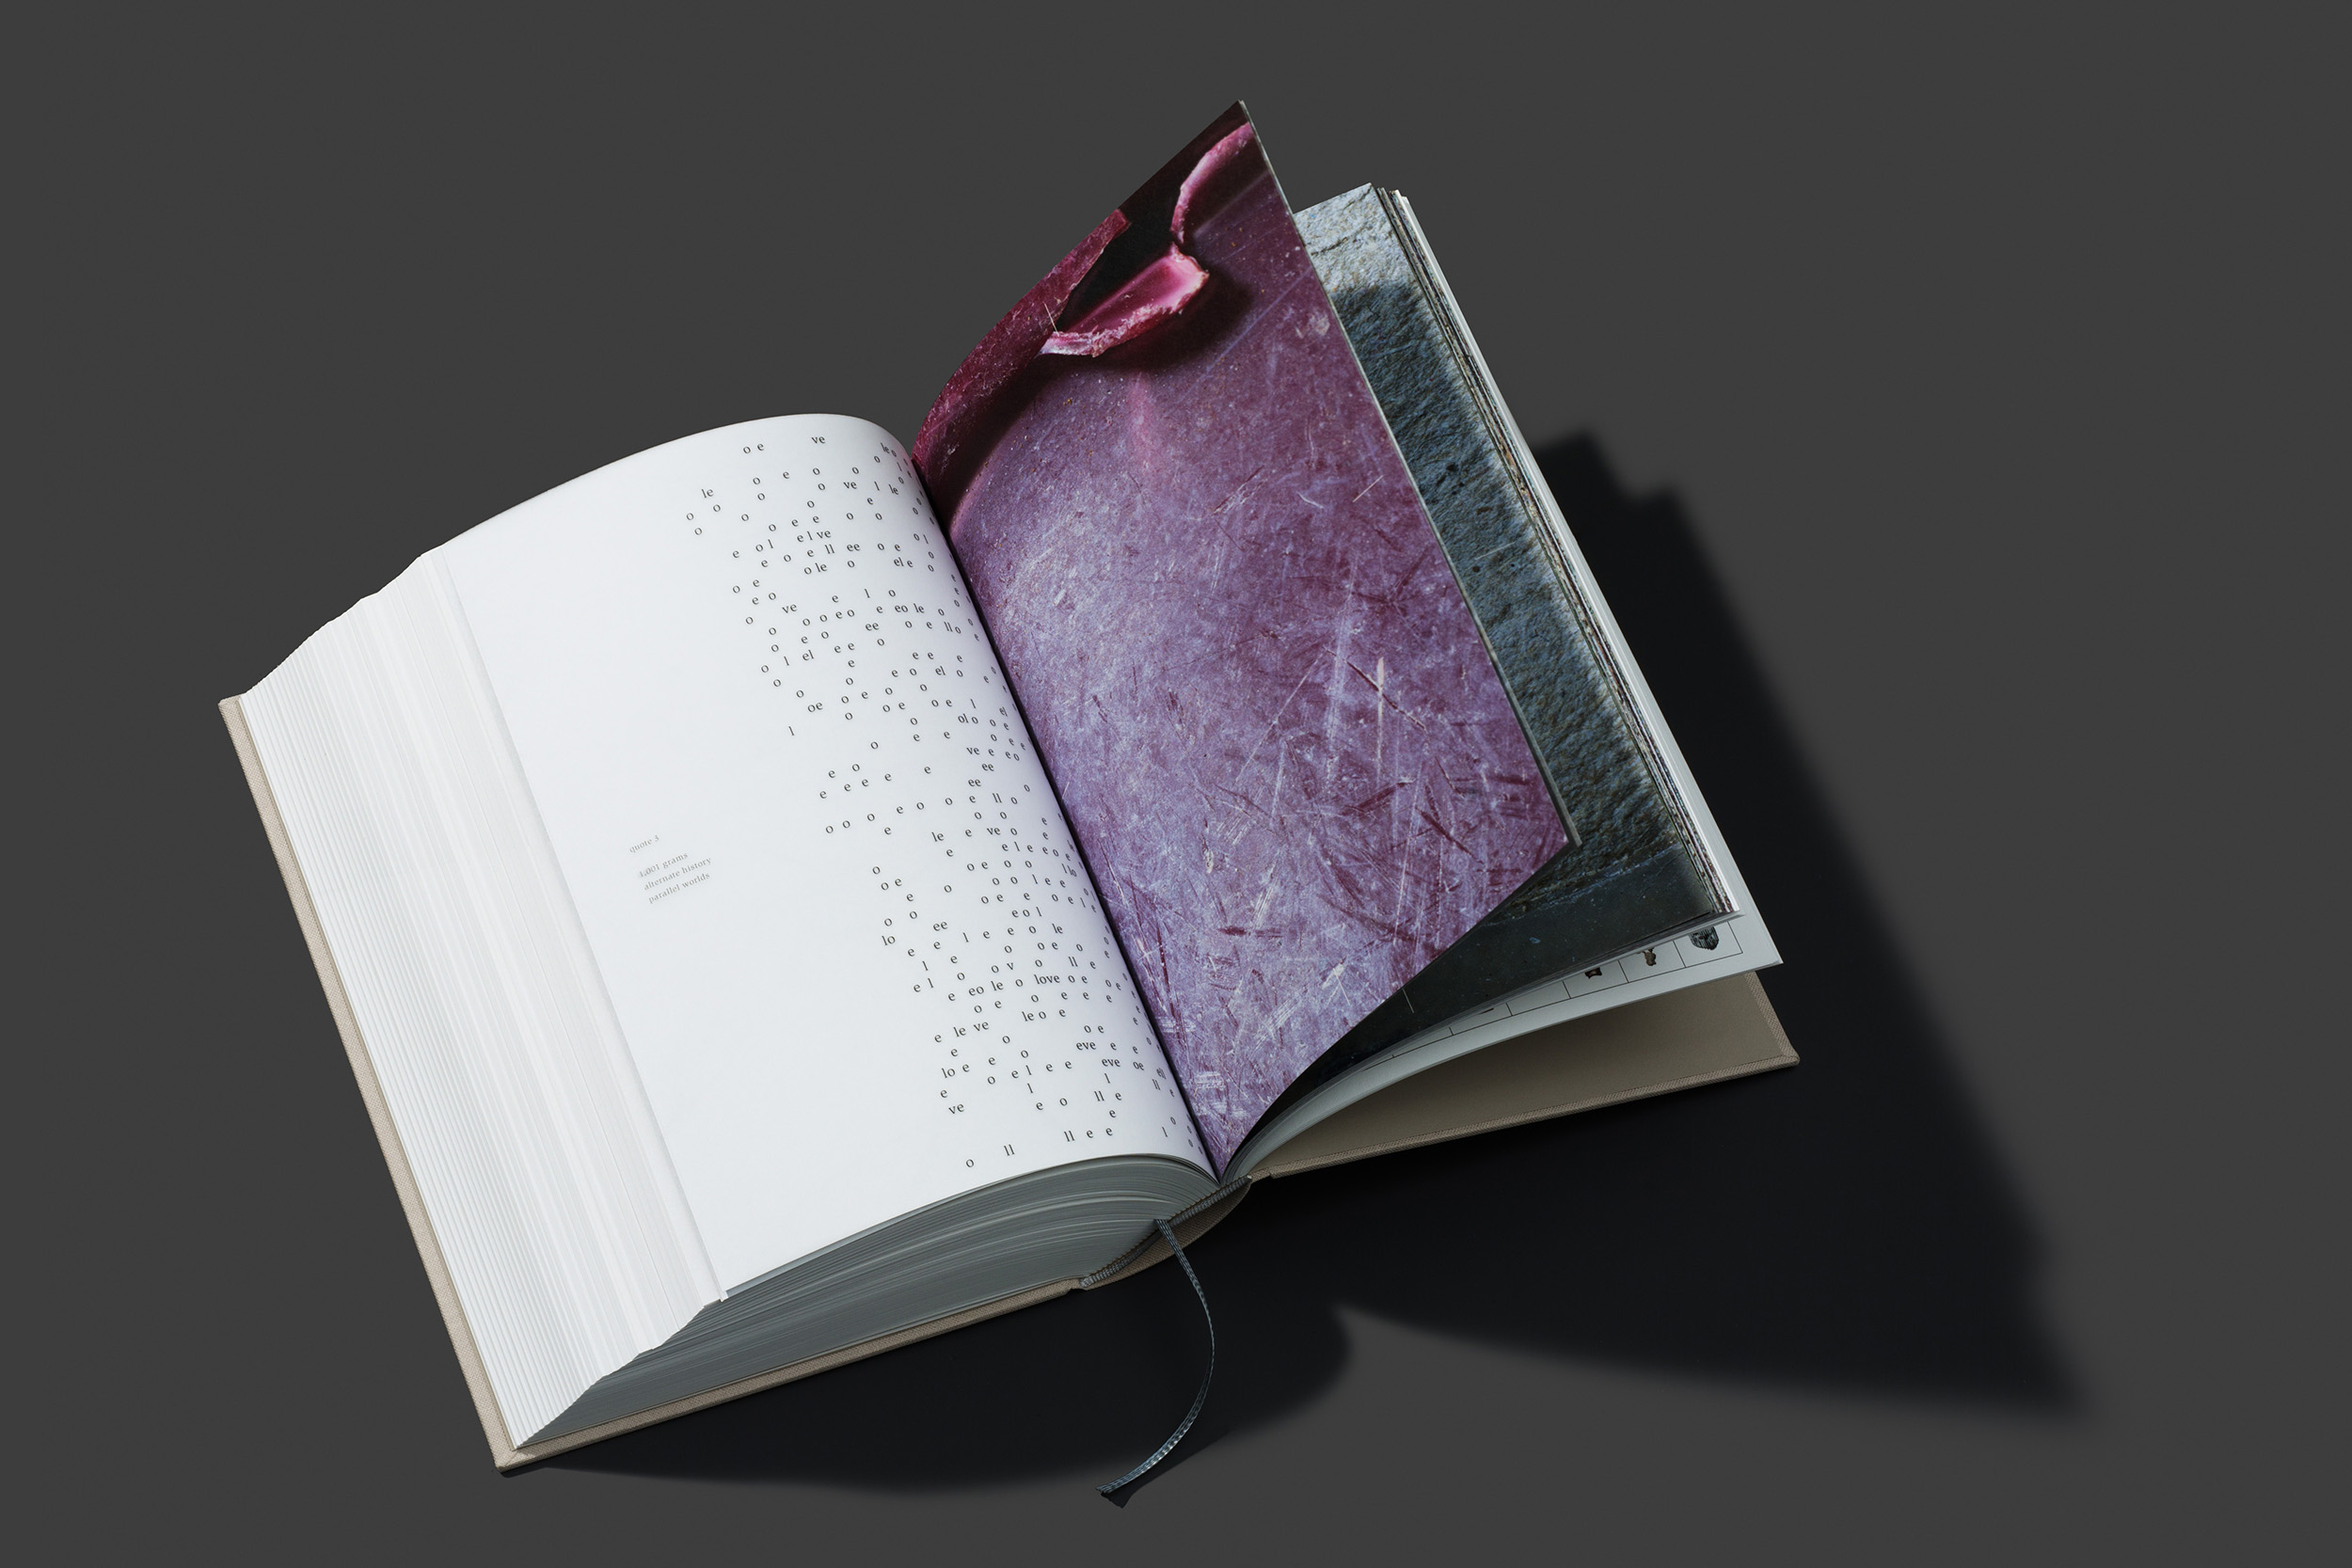 worthless_book_09.jpg